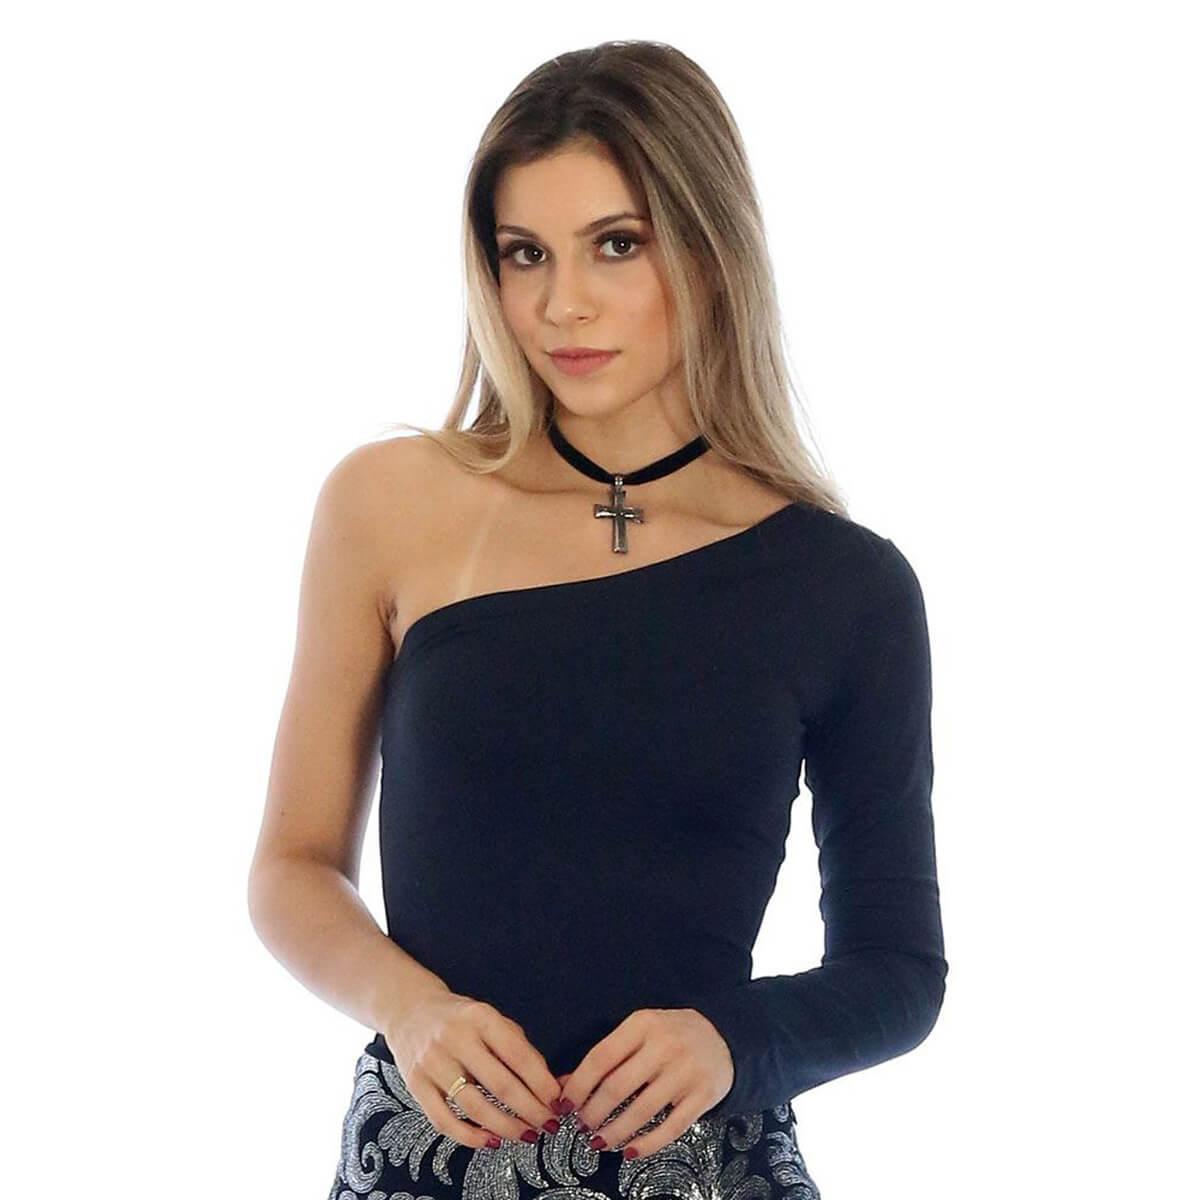 Blusa Feminina de Ombro Só Manga Longa Preta